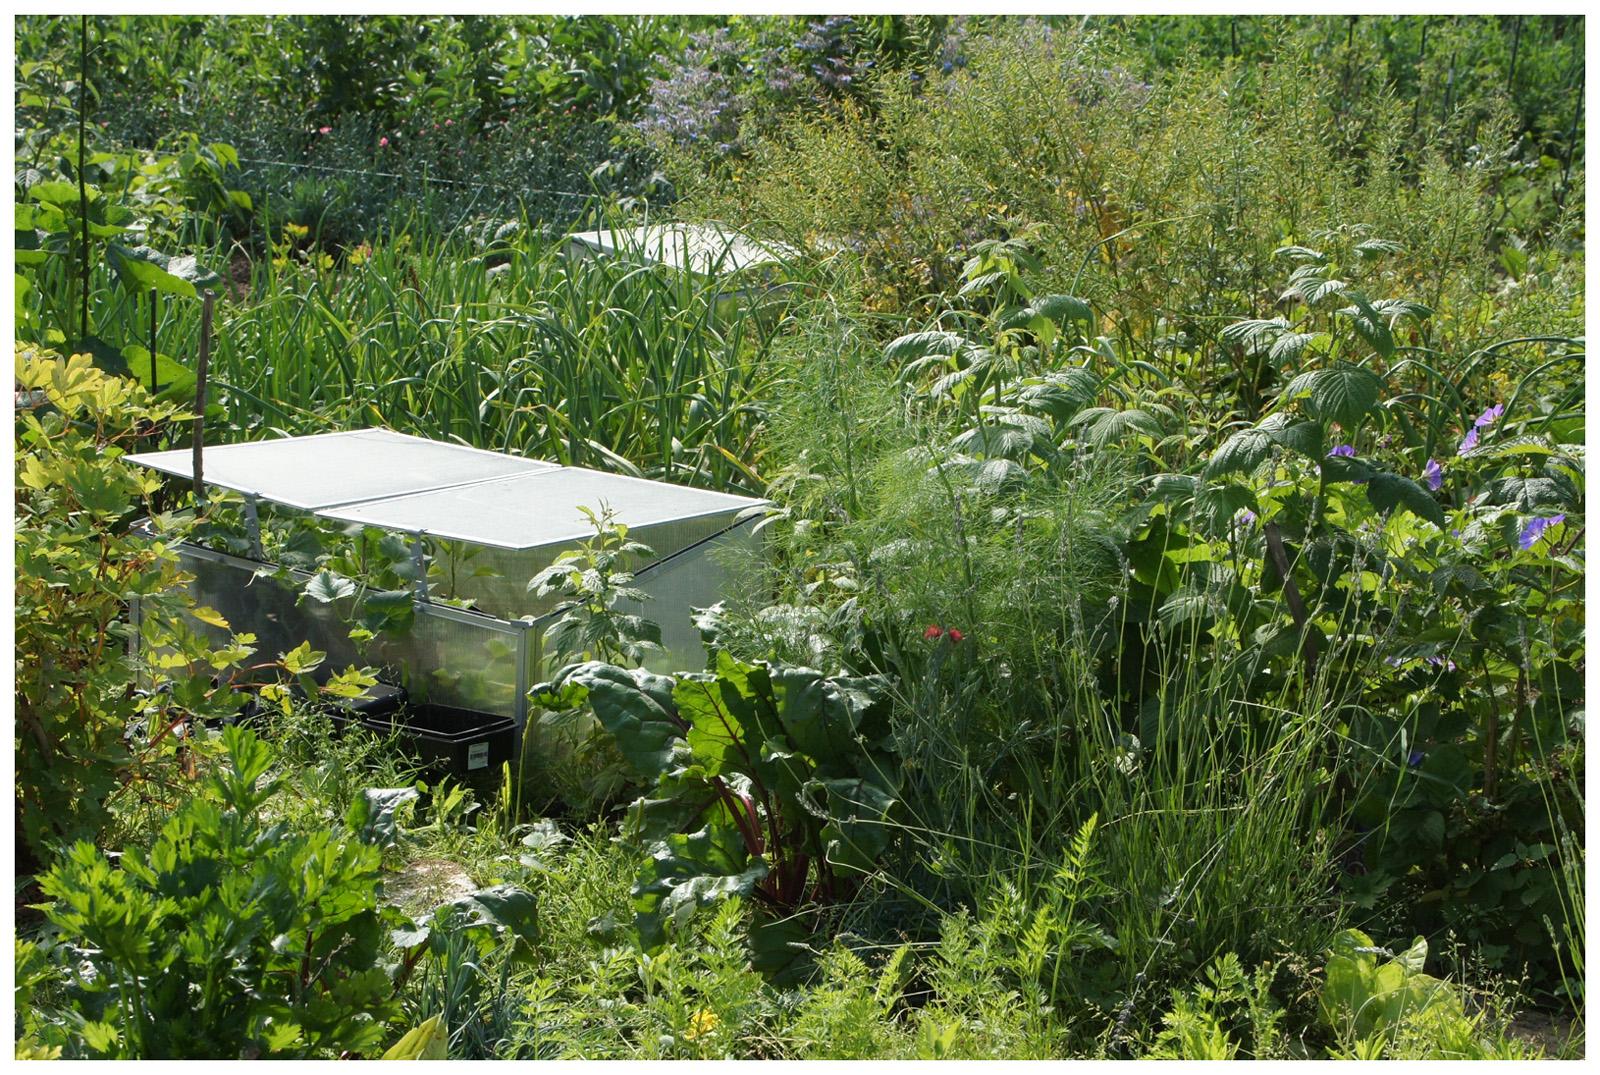 Cergipontin courdimanche val d 39 oise les jardins for Jardin ouvrier